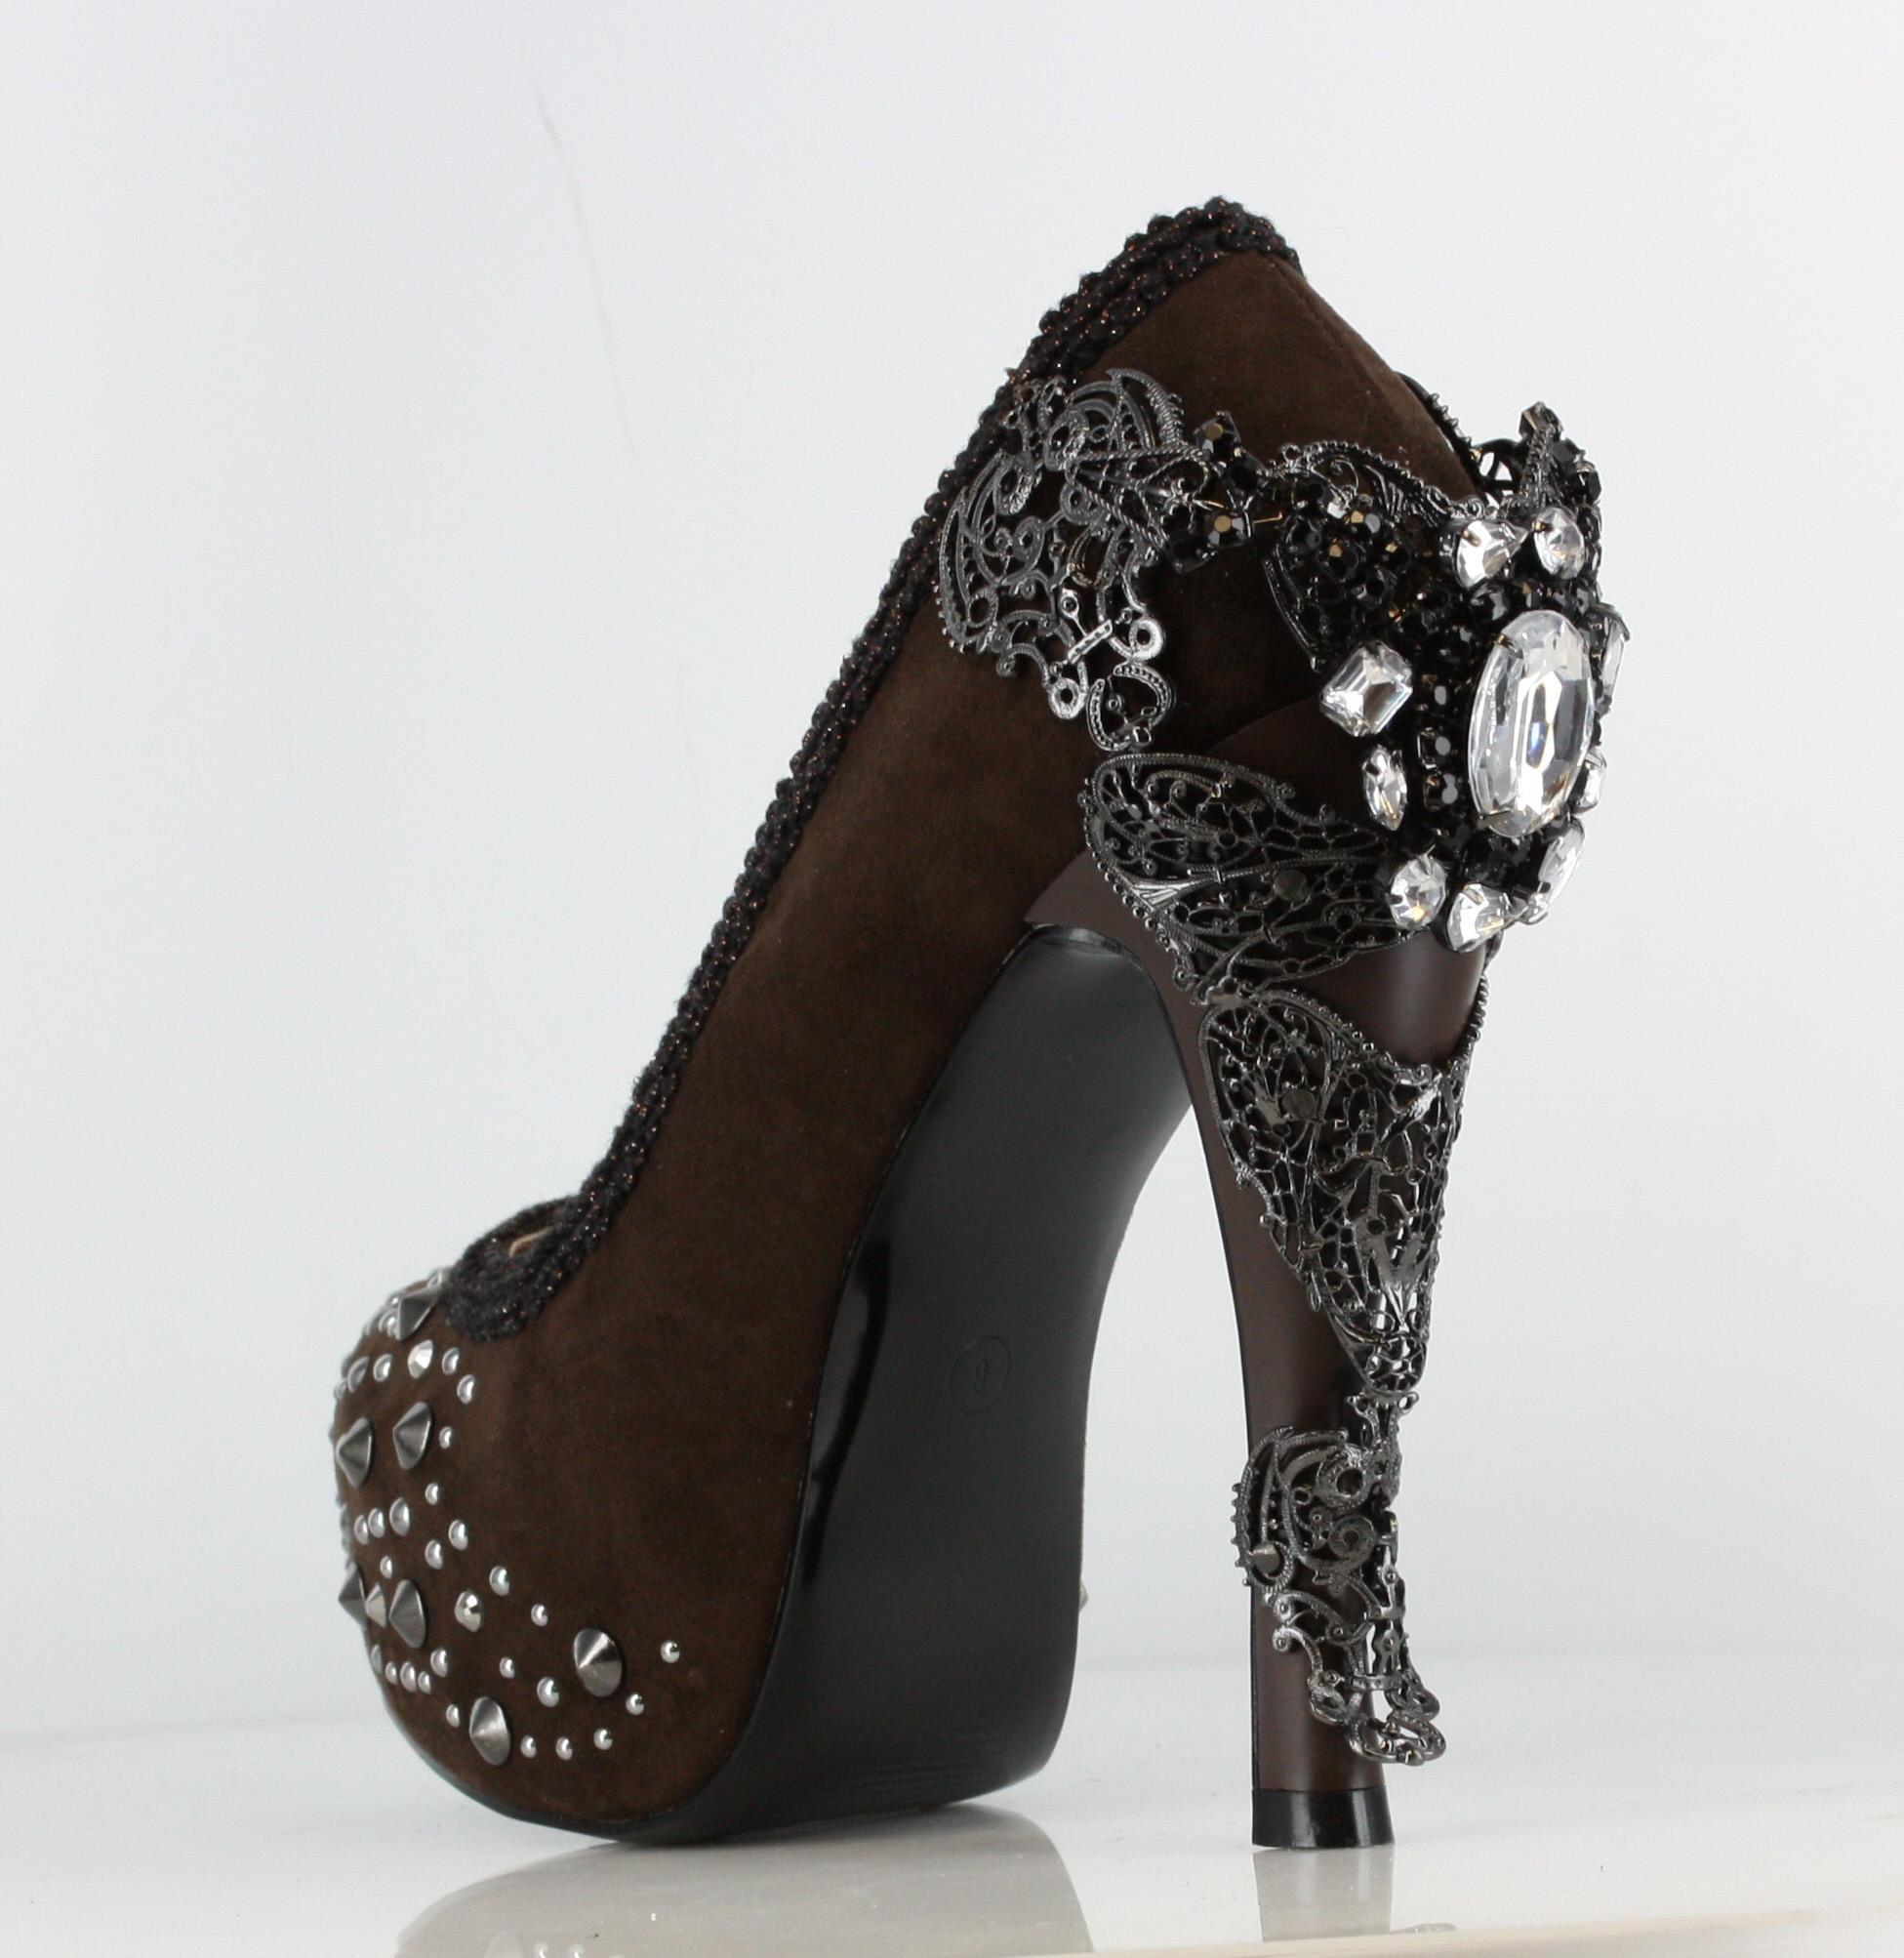 hades_shoes_amina_brown_steampunk_platforms_platforms_2.jpg